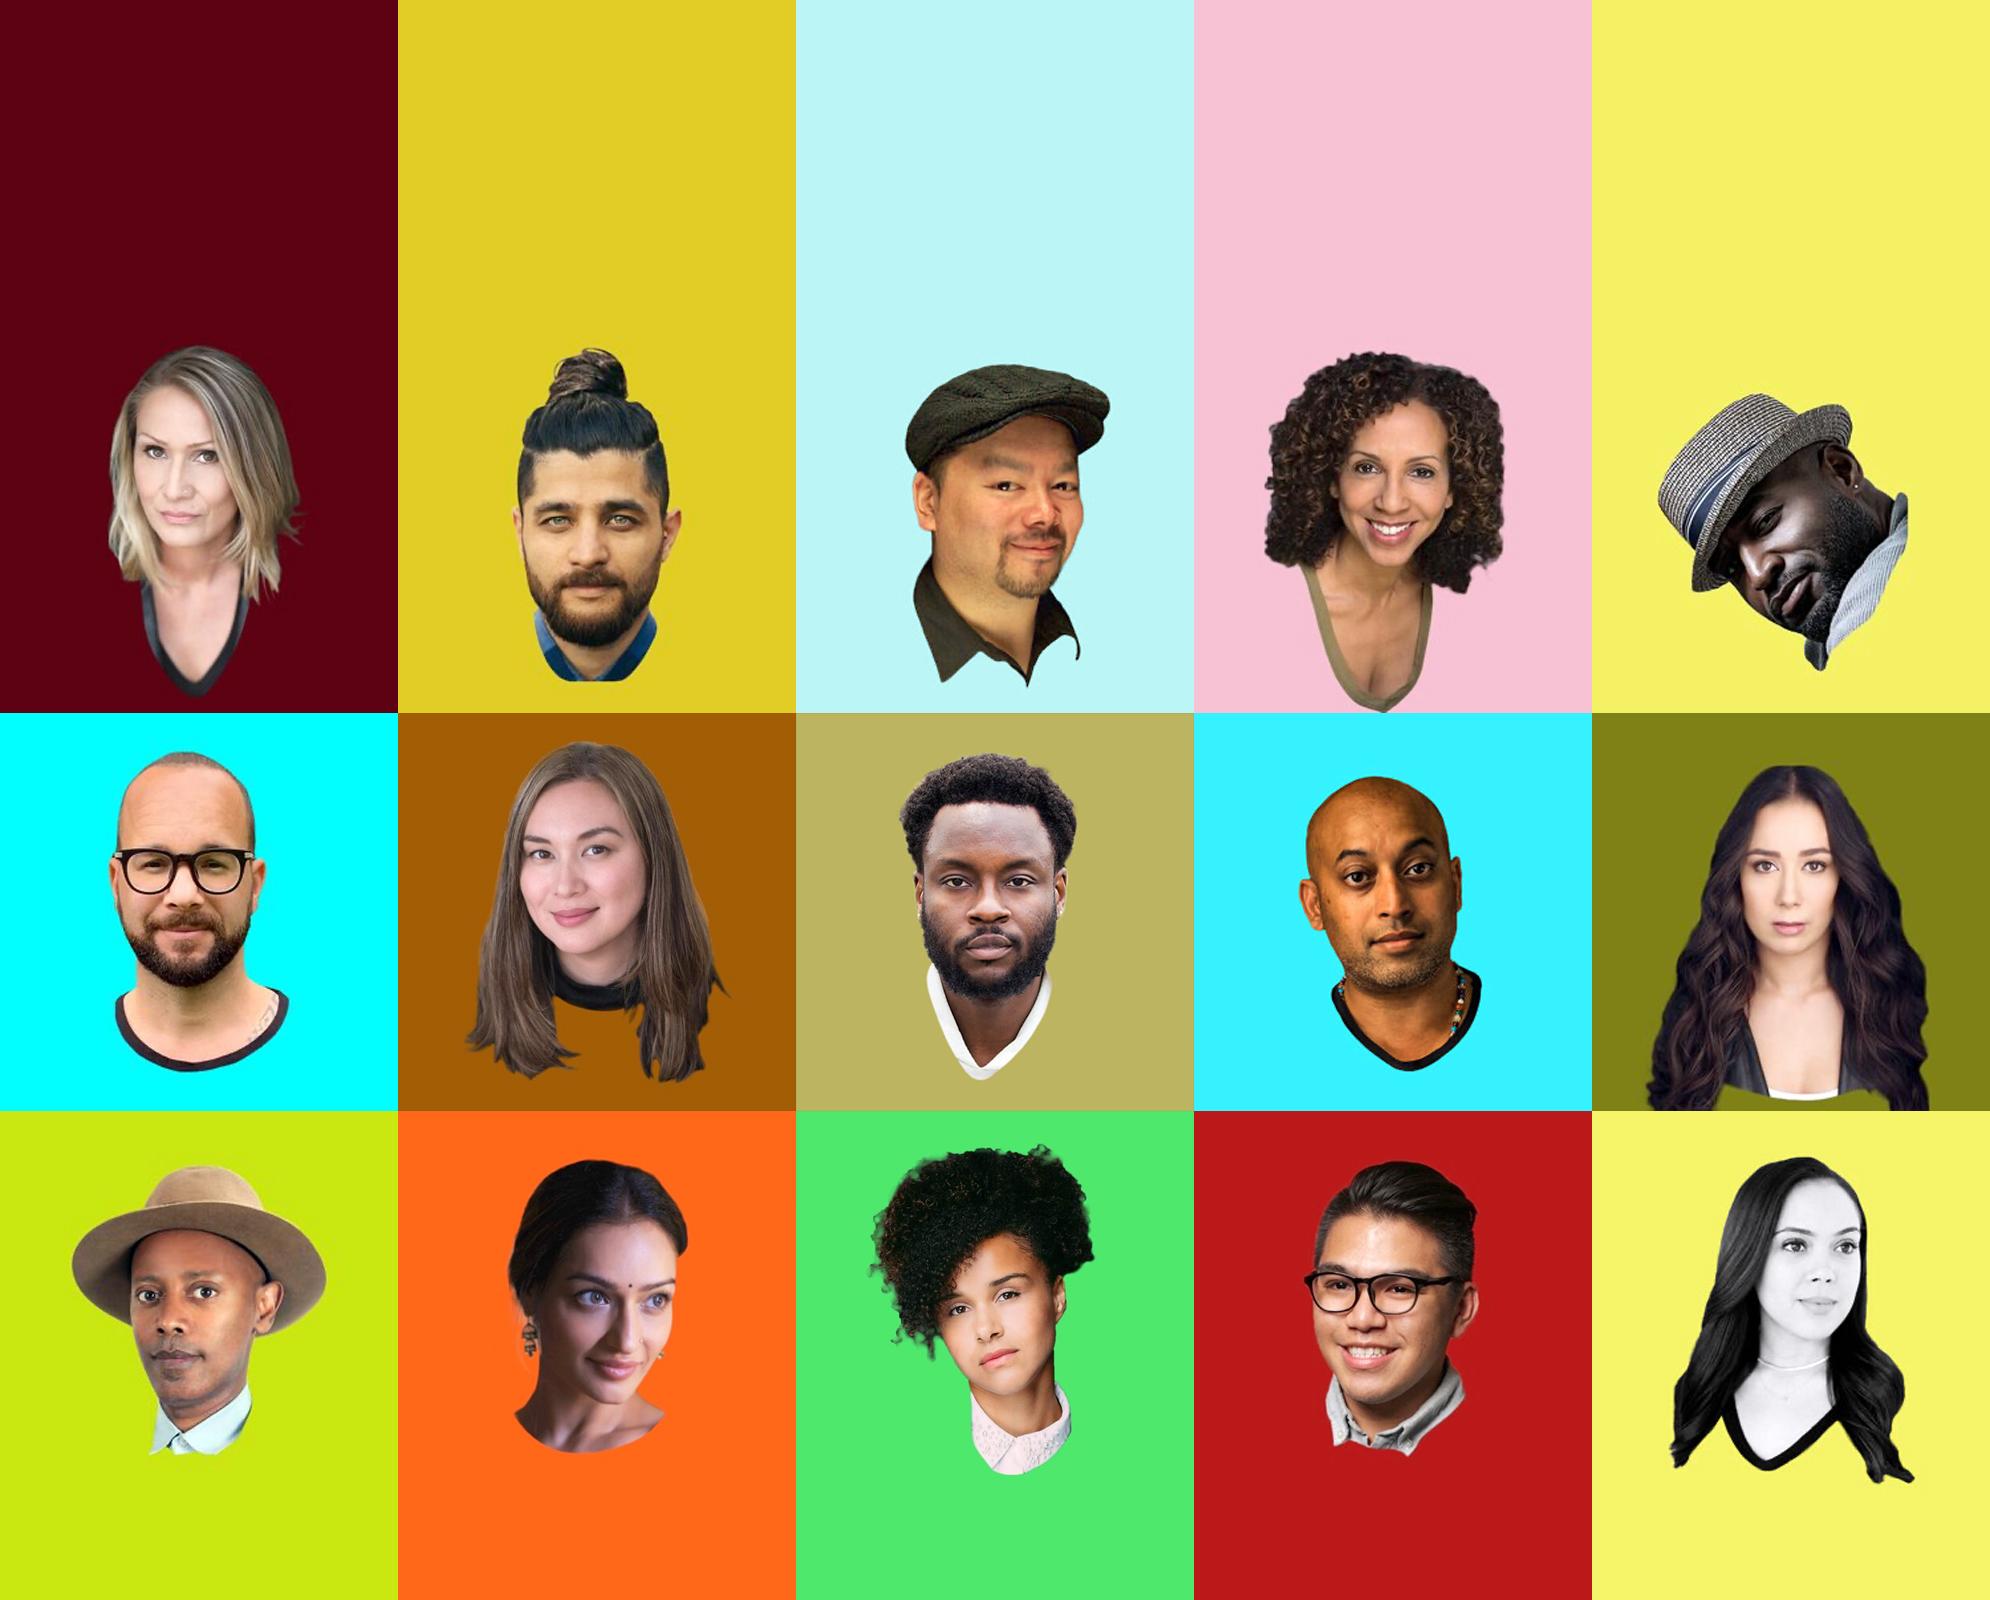 media film industry creatives diversity bipoc